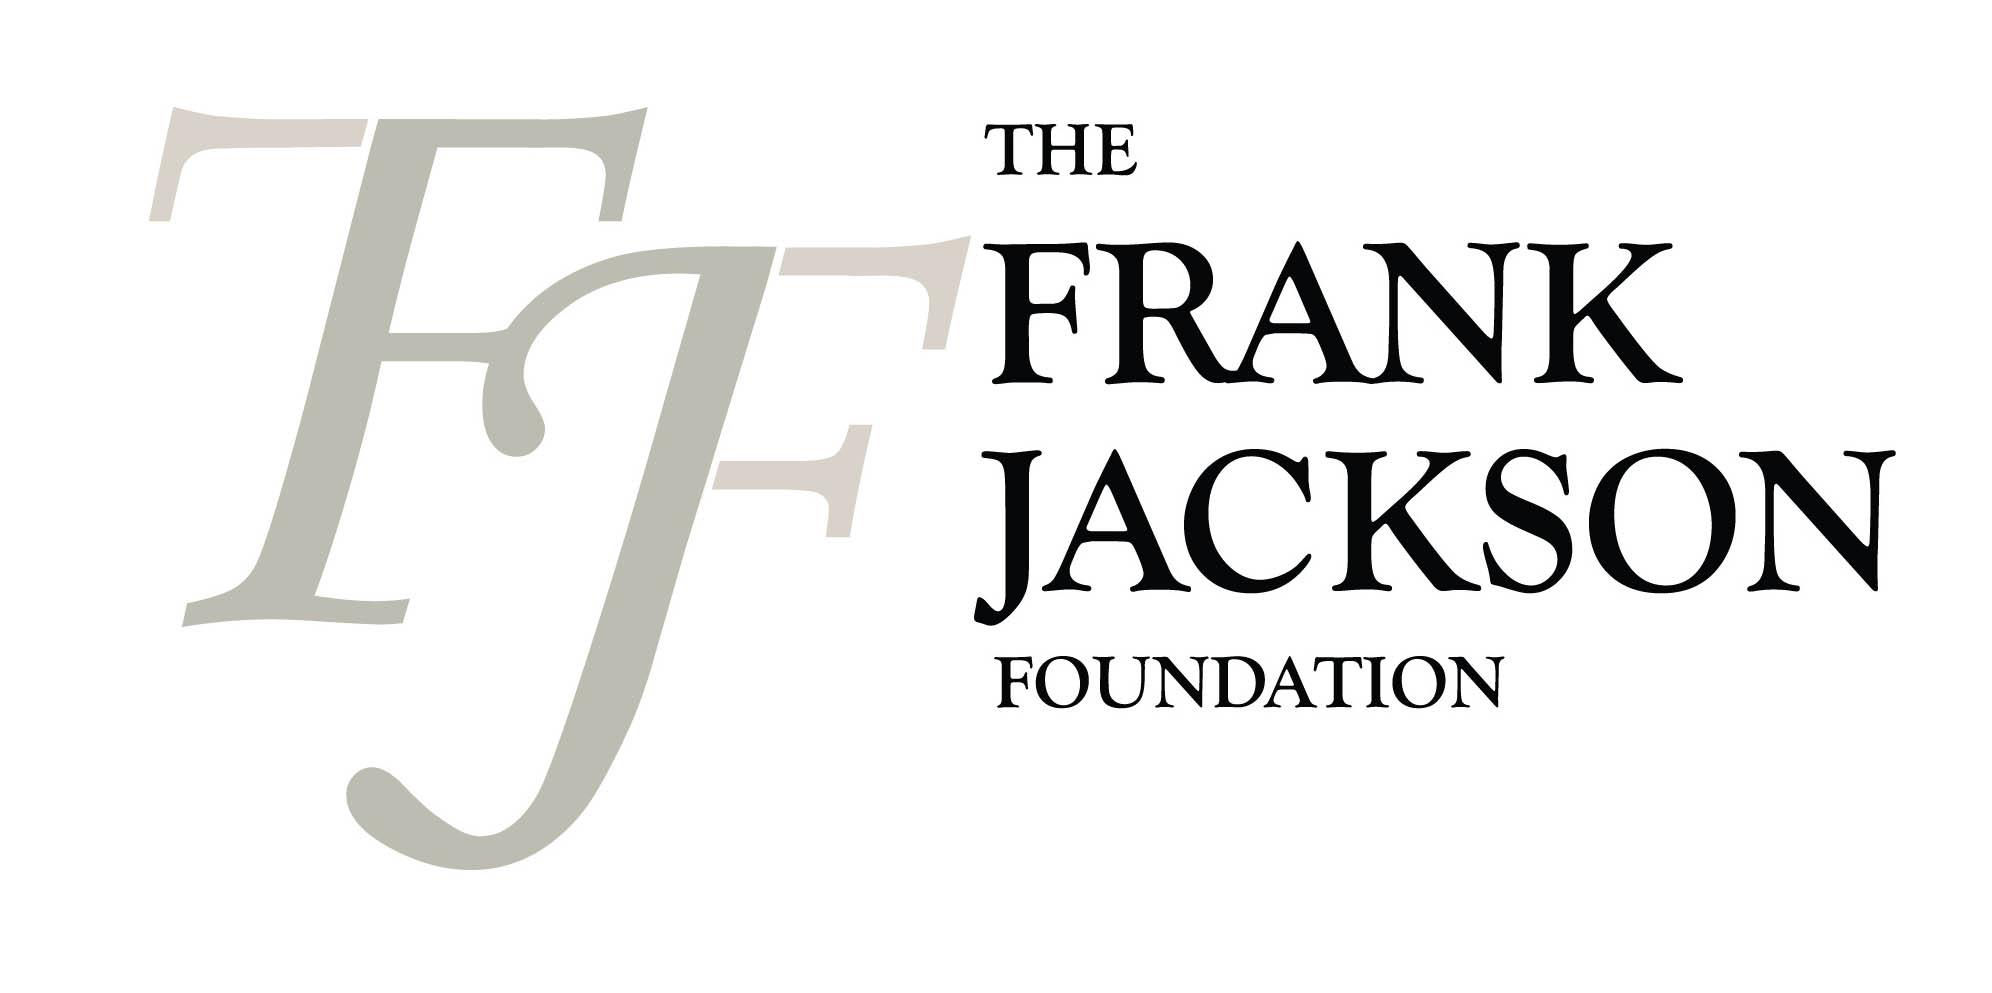 the frank jackson foundation